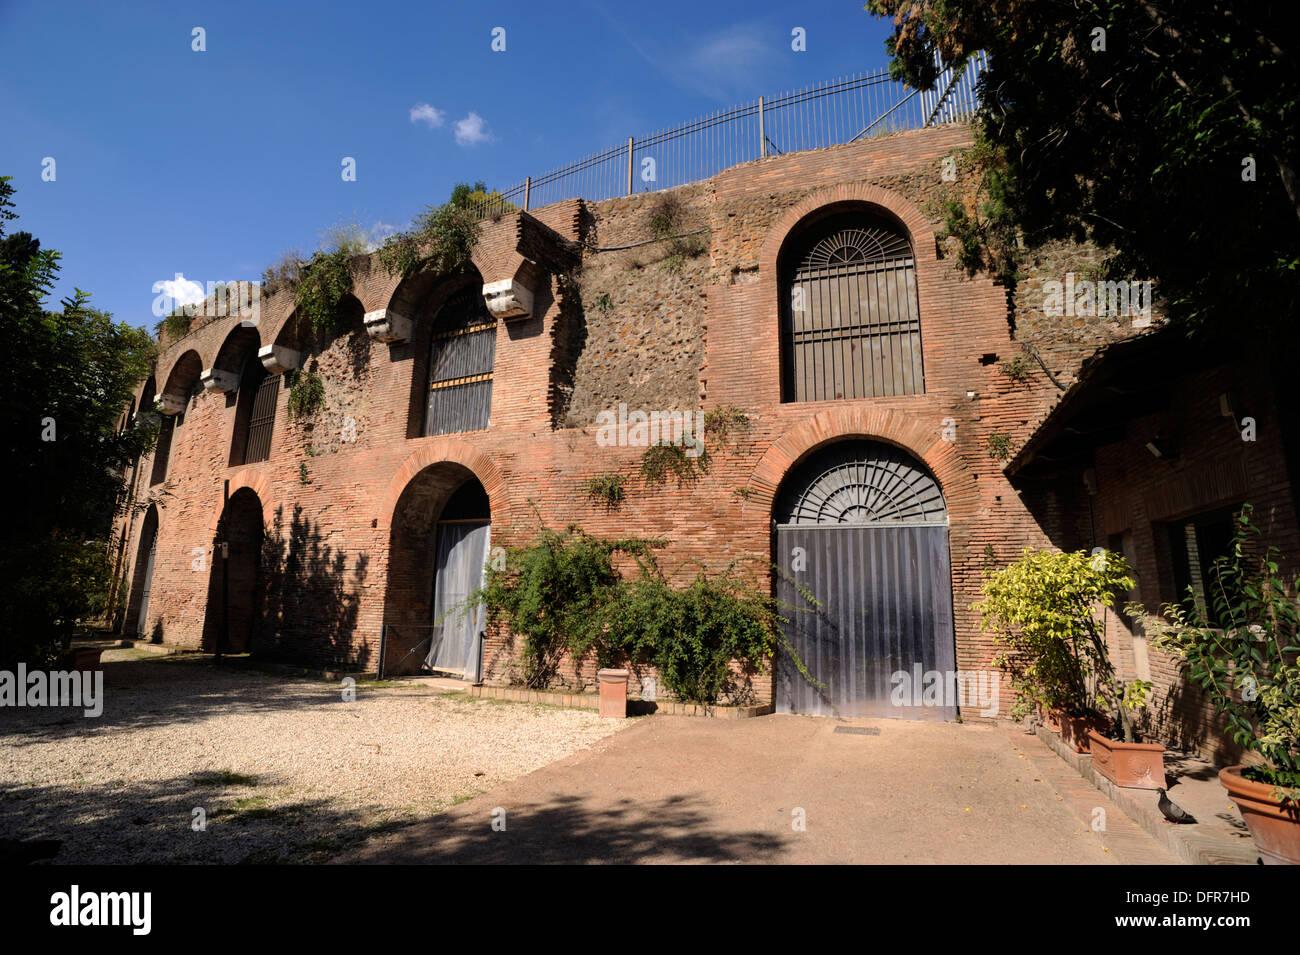 italy, rome, colle oppio (oppian hill), domus aurea, house of emperor nero - Stock Image